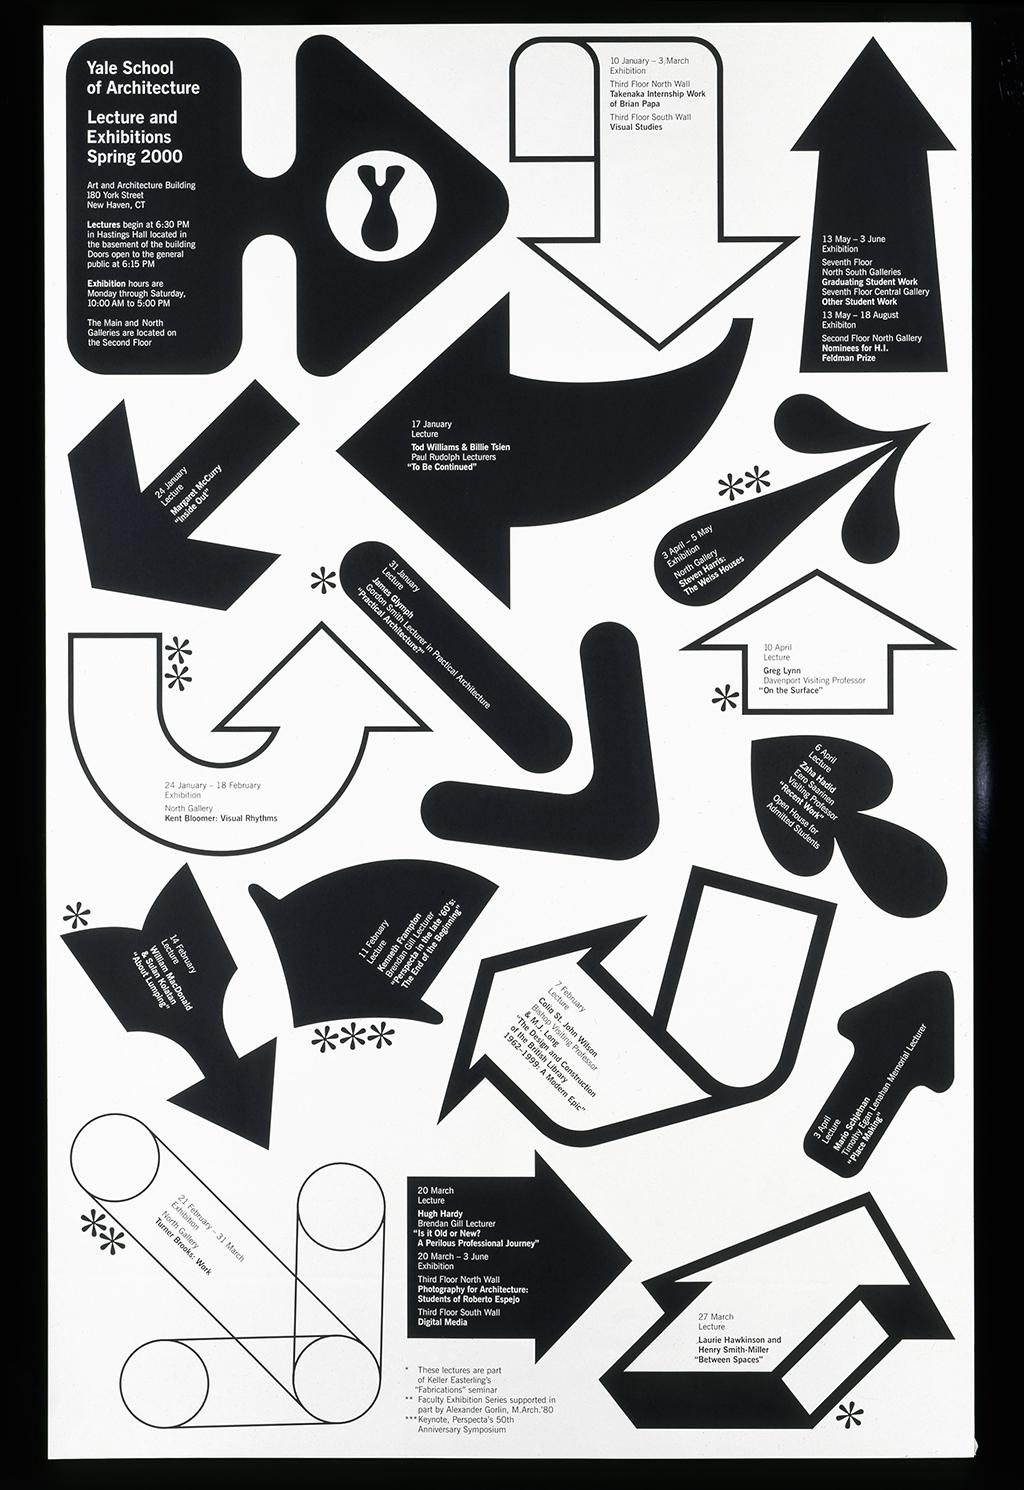 9_CW_Bierut_Yale-Arch-Arrows-poster_Pentagram